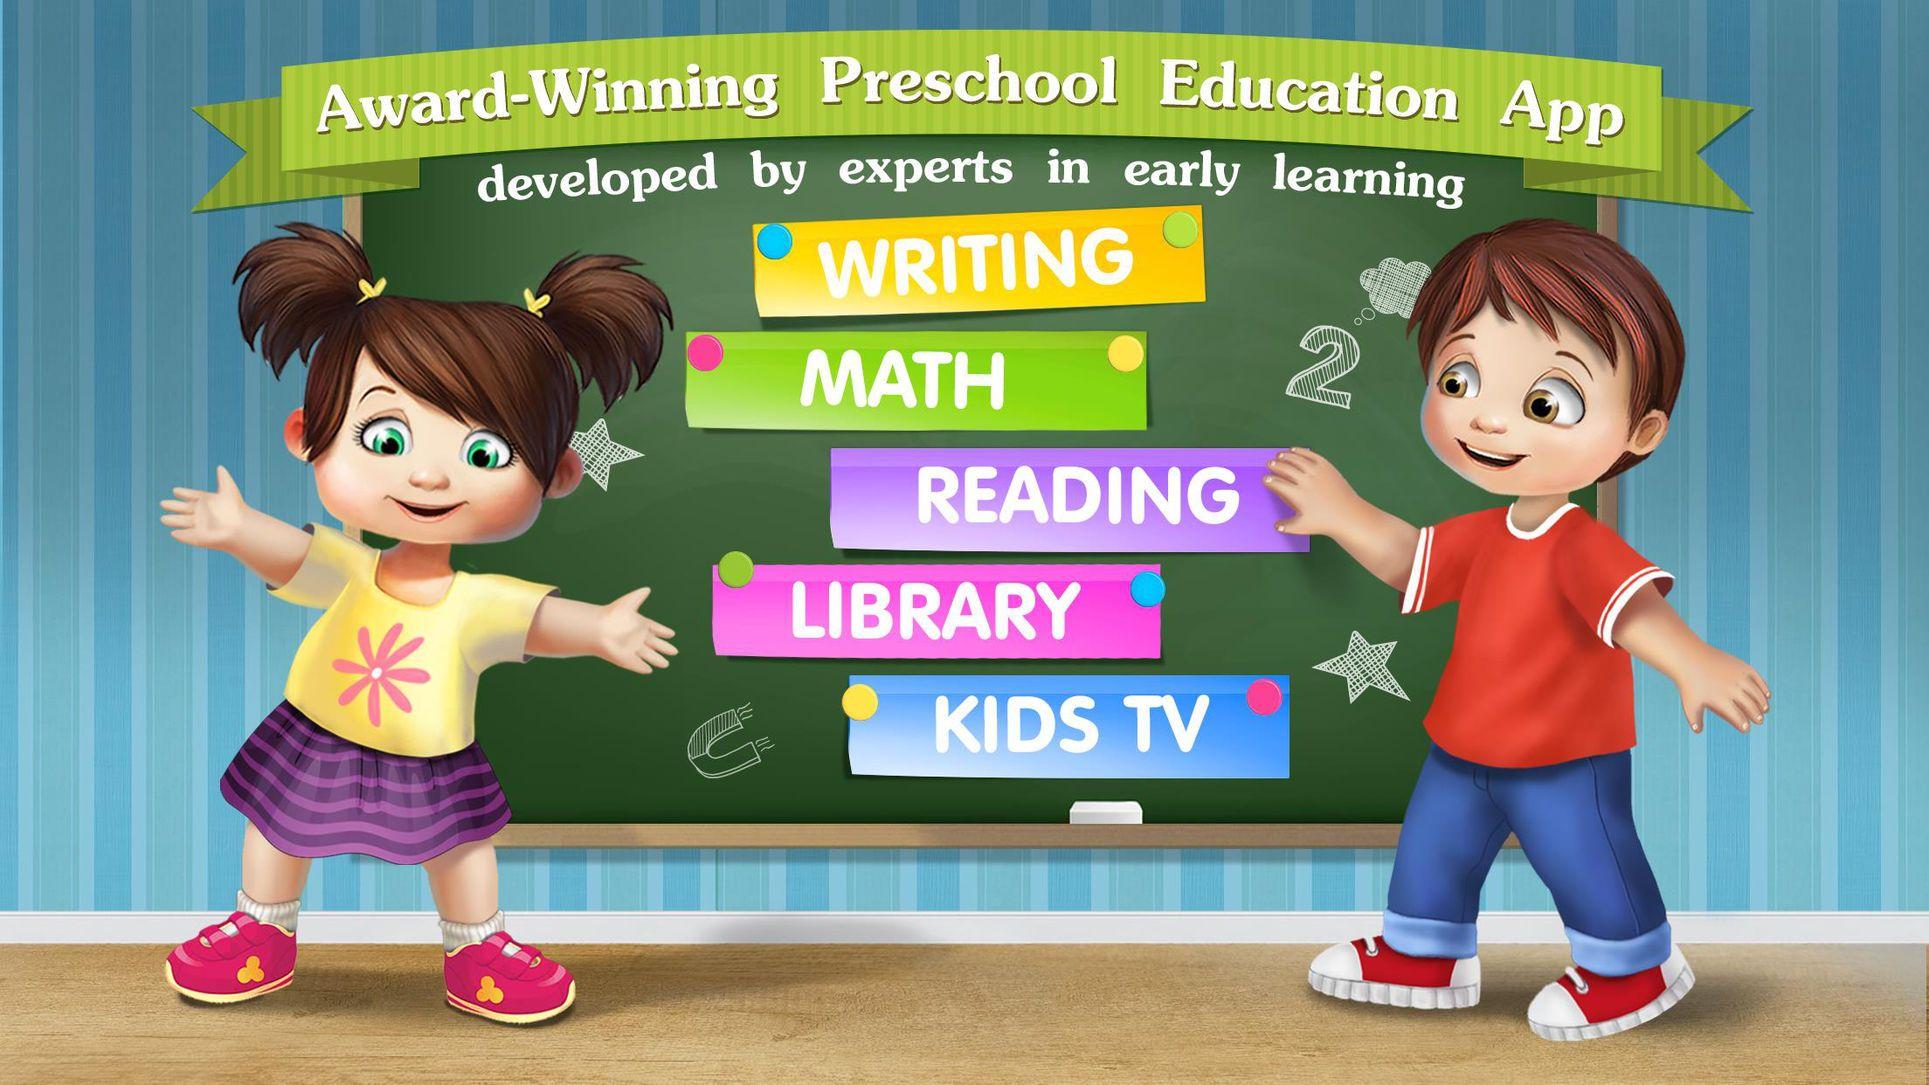 Kindergarten math (With images) Preschool education